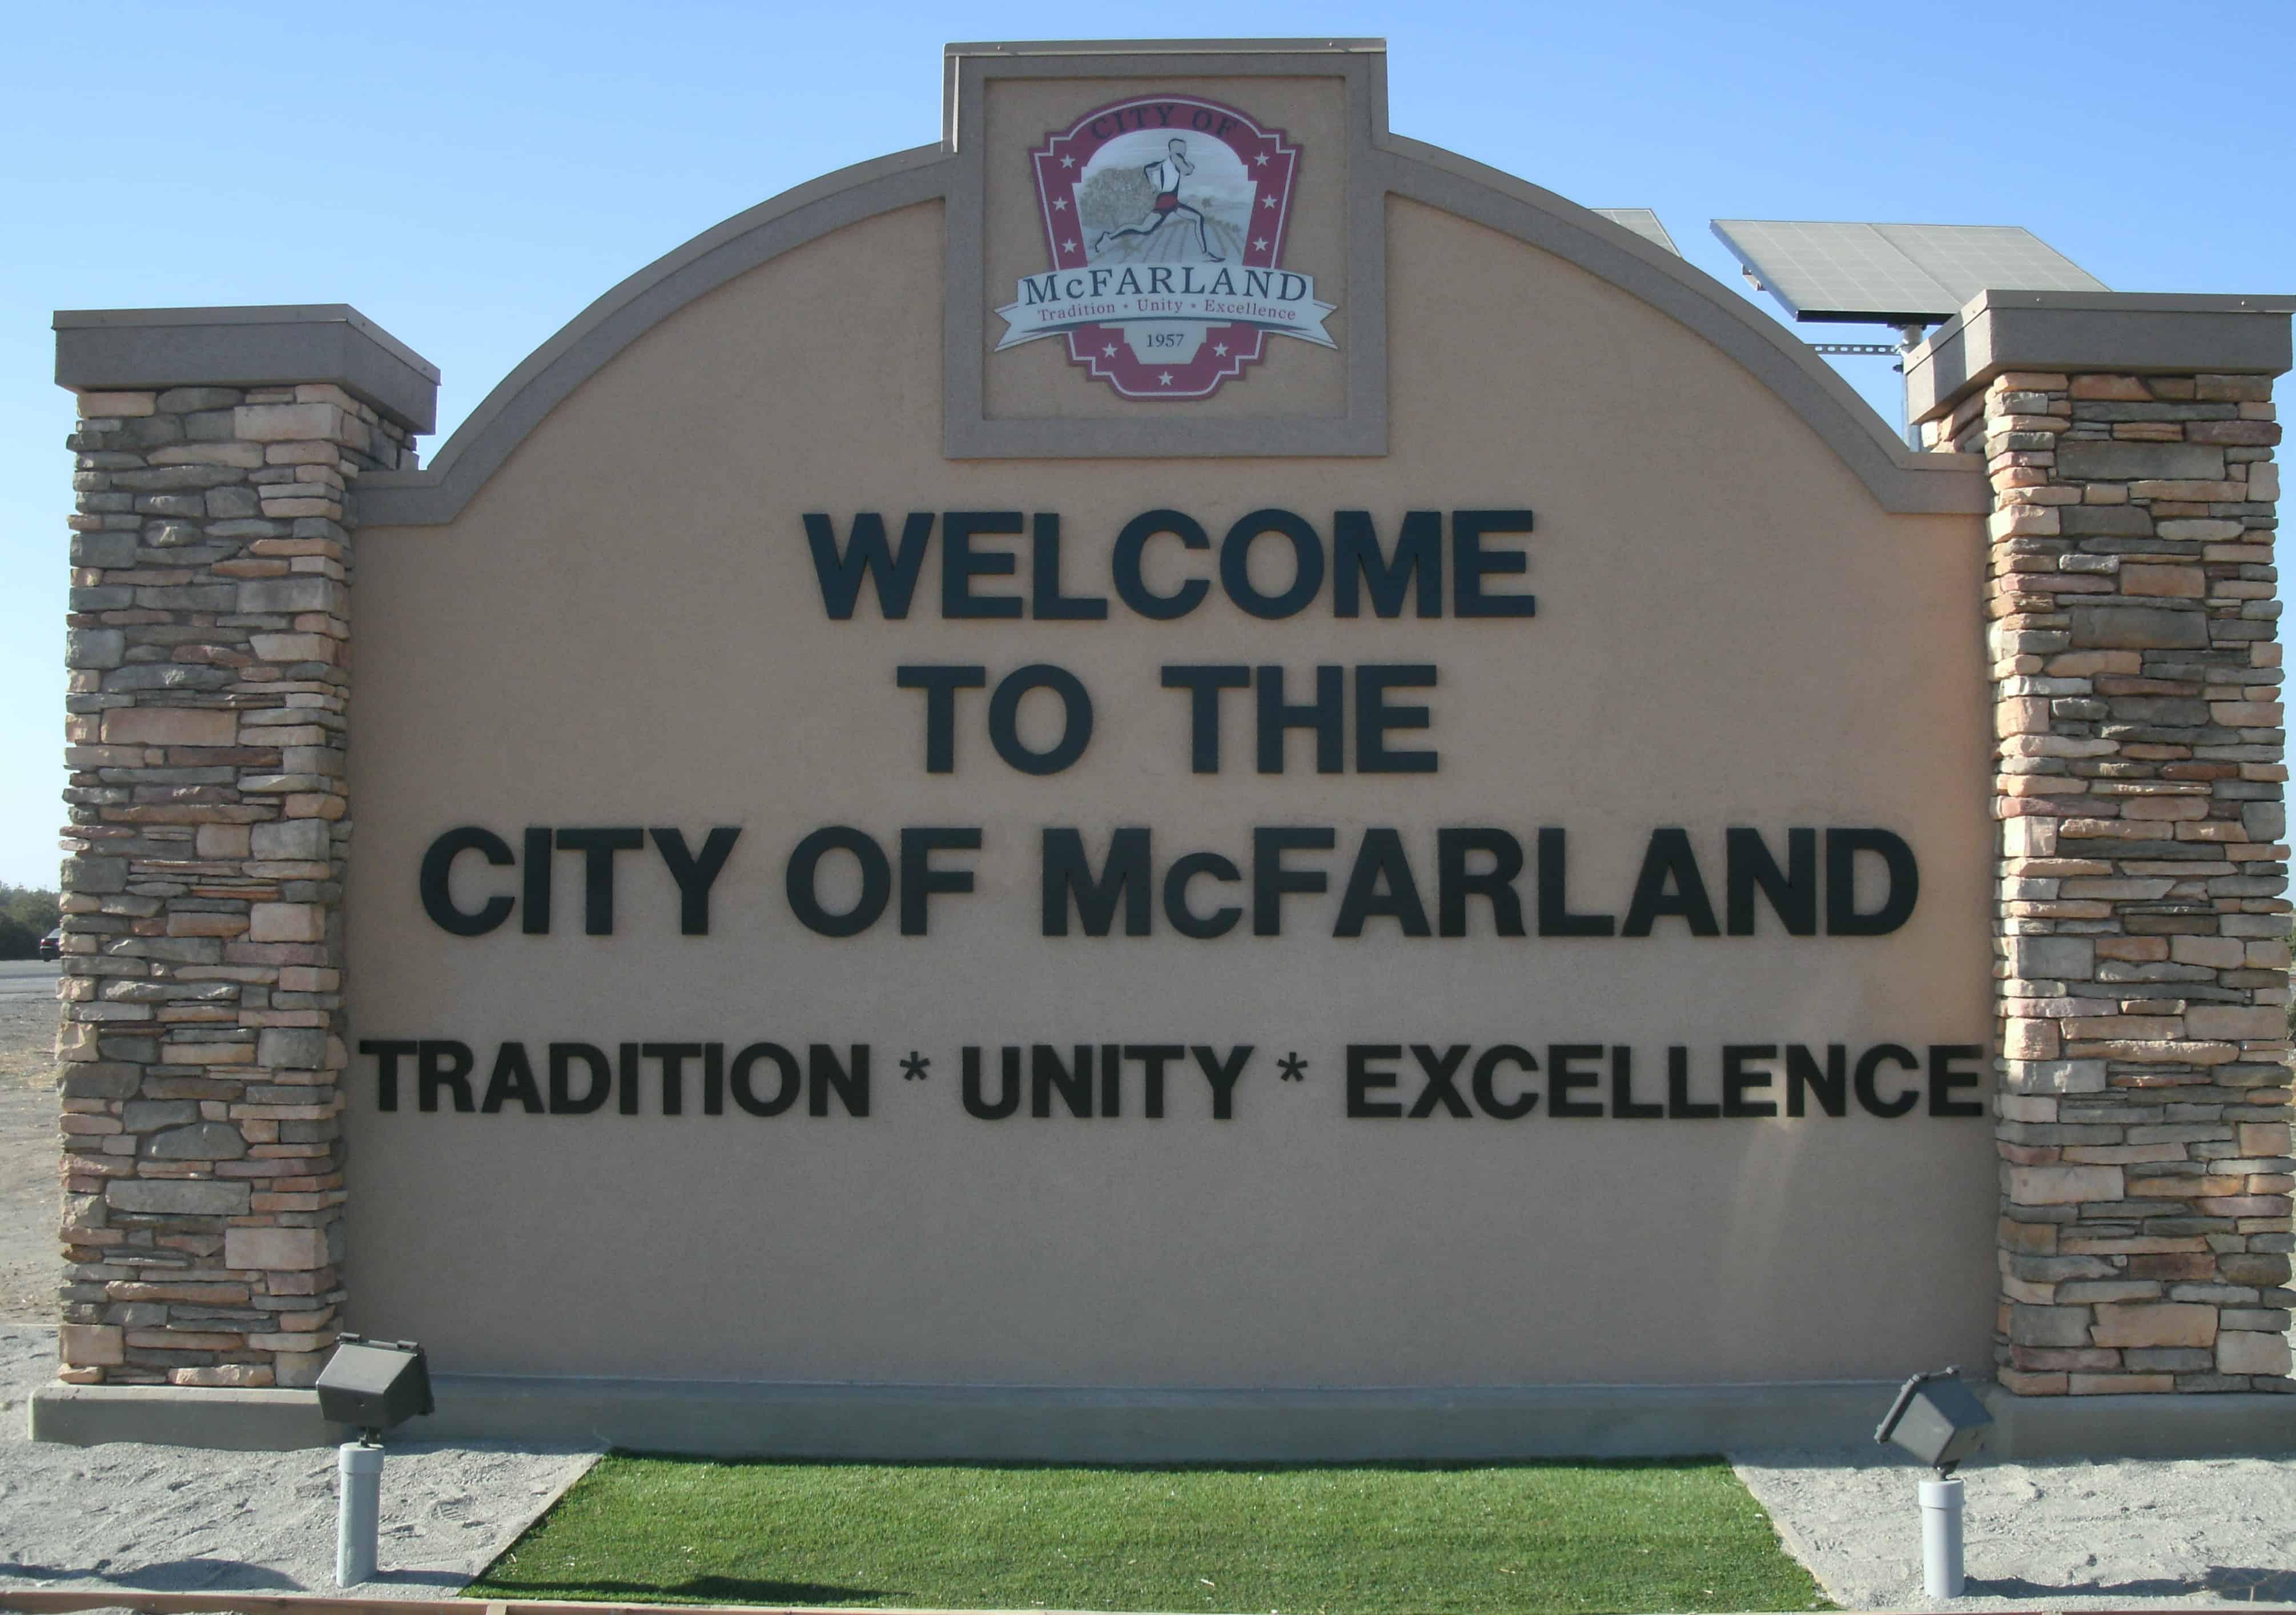 McFarland Real Estate